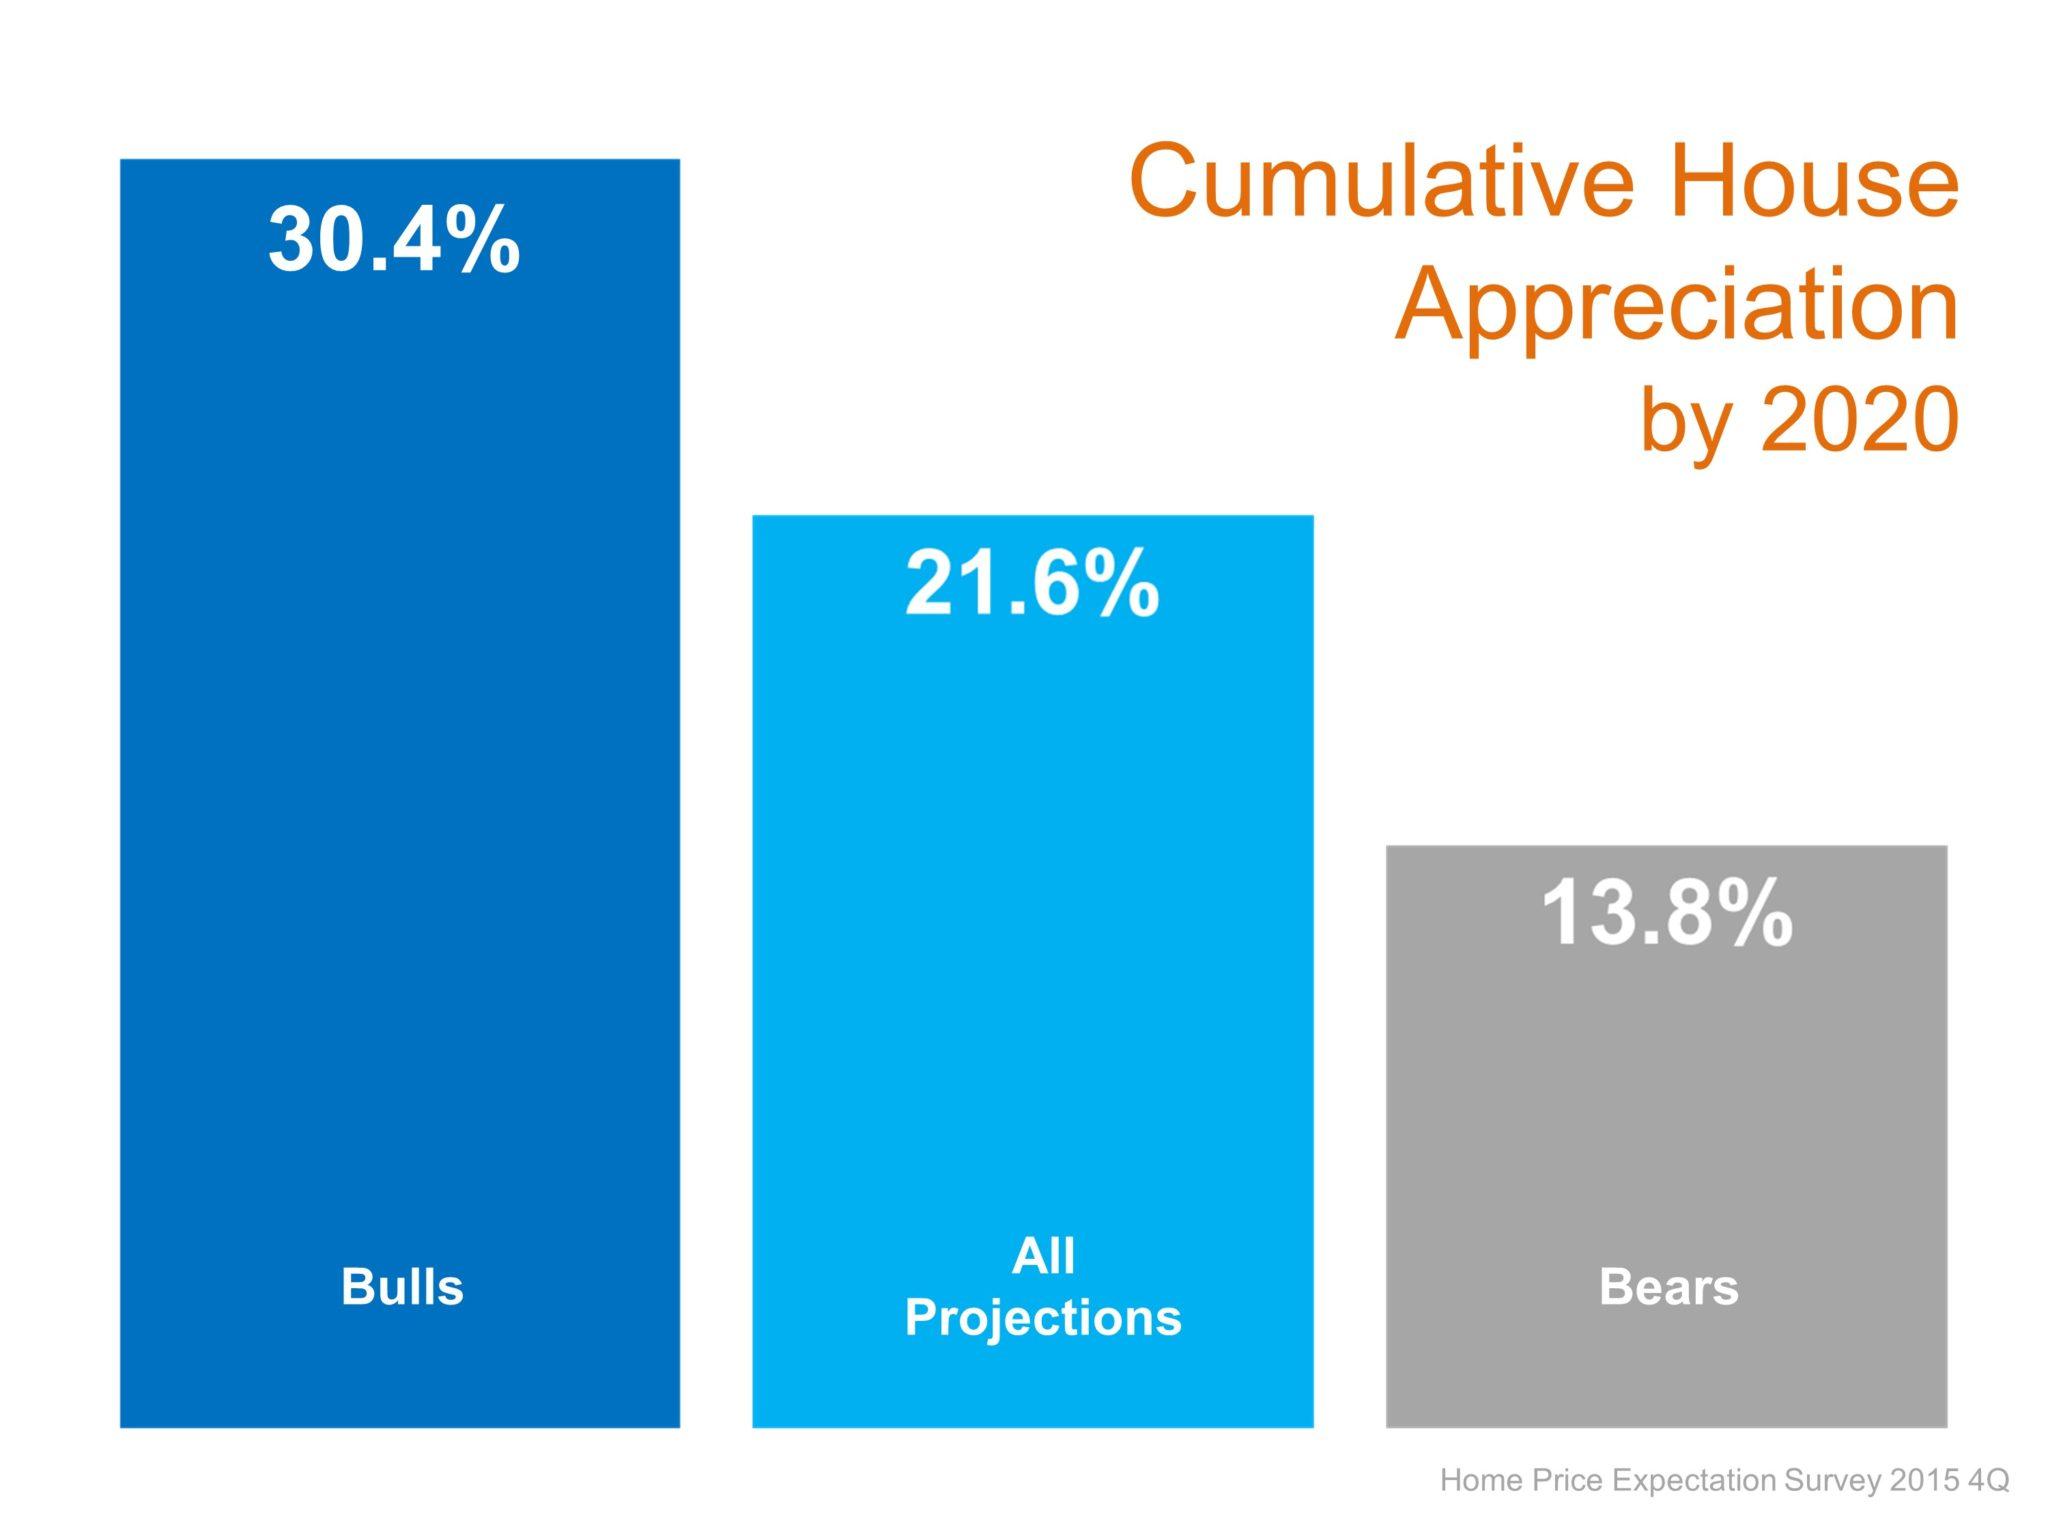 housing appreciation by 2020